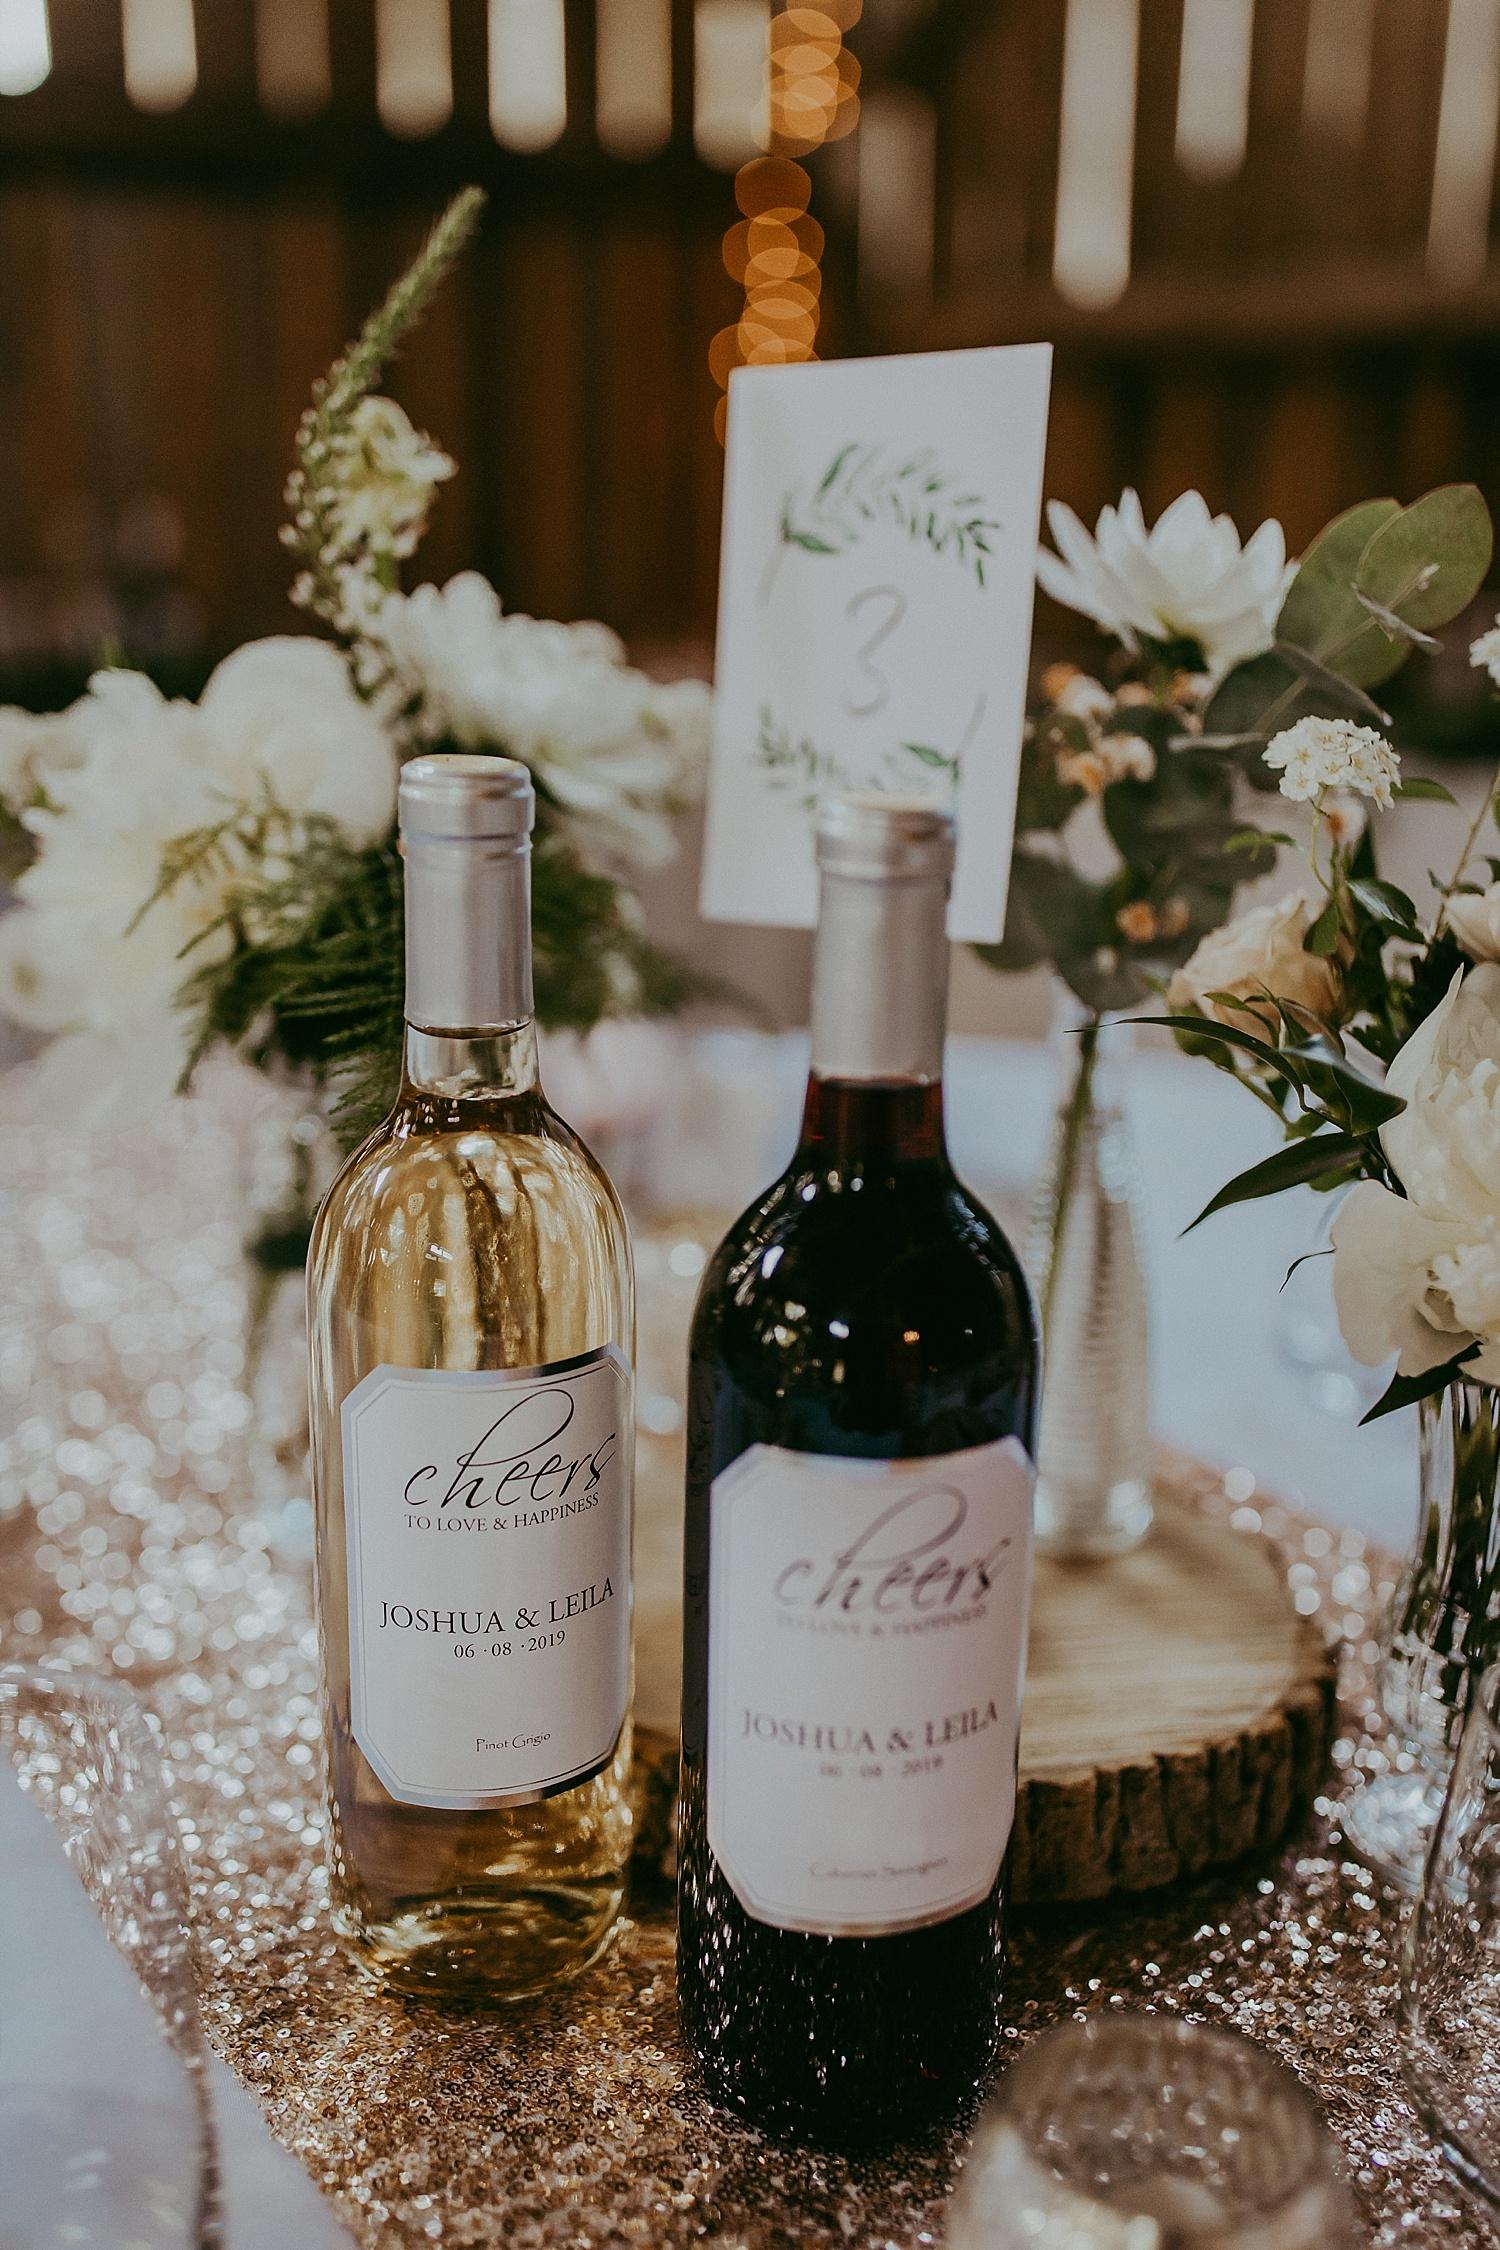 Reception details, wine bottles